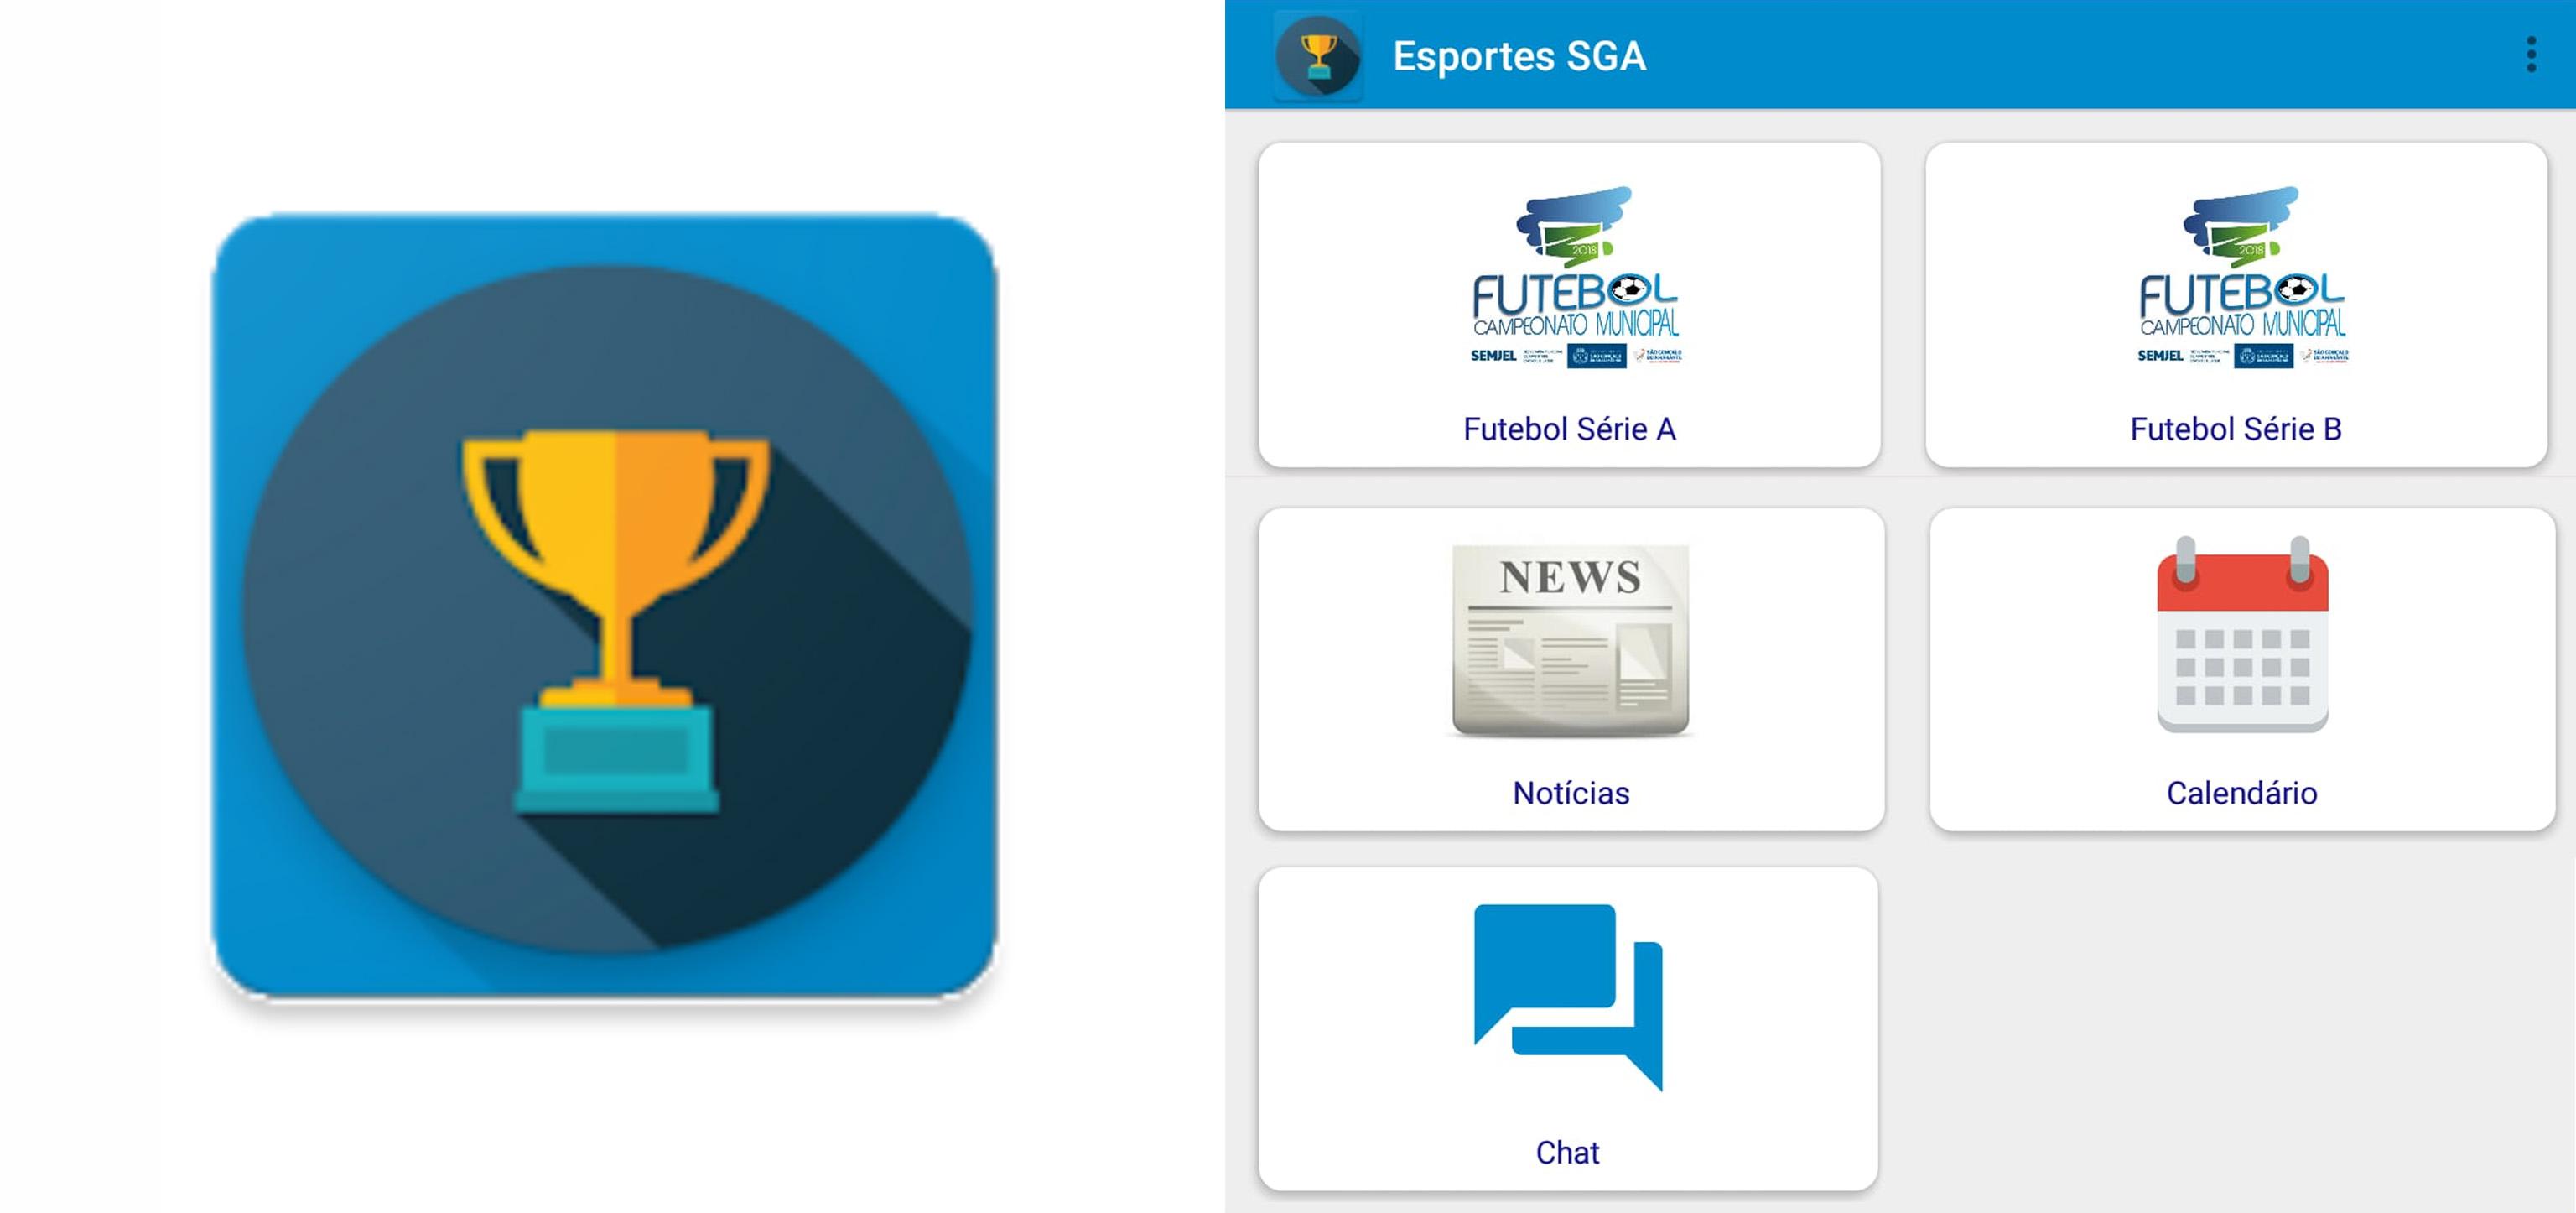 Tecnologia no esporte: Conheça o aplicativo ESPORTES SGA